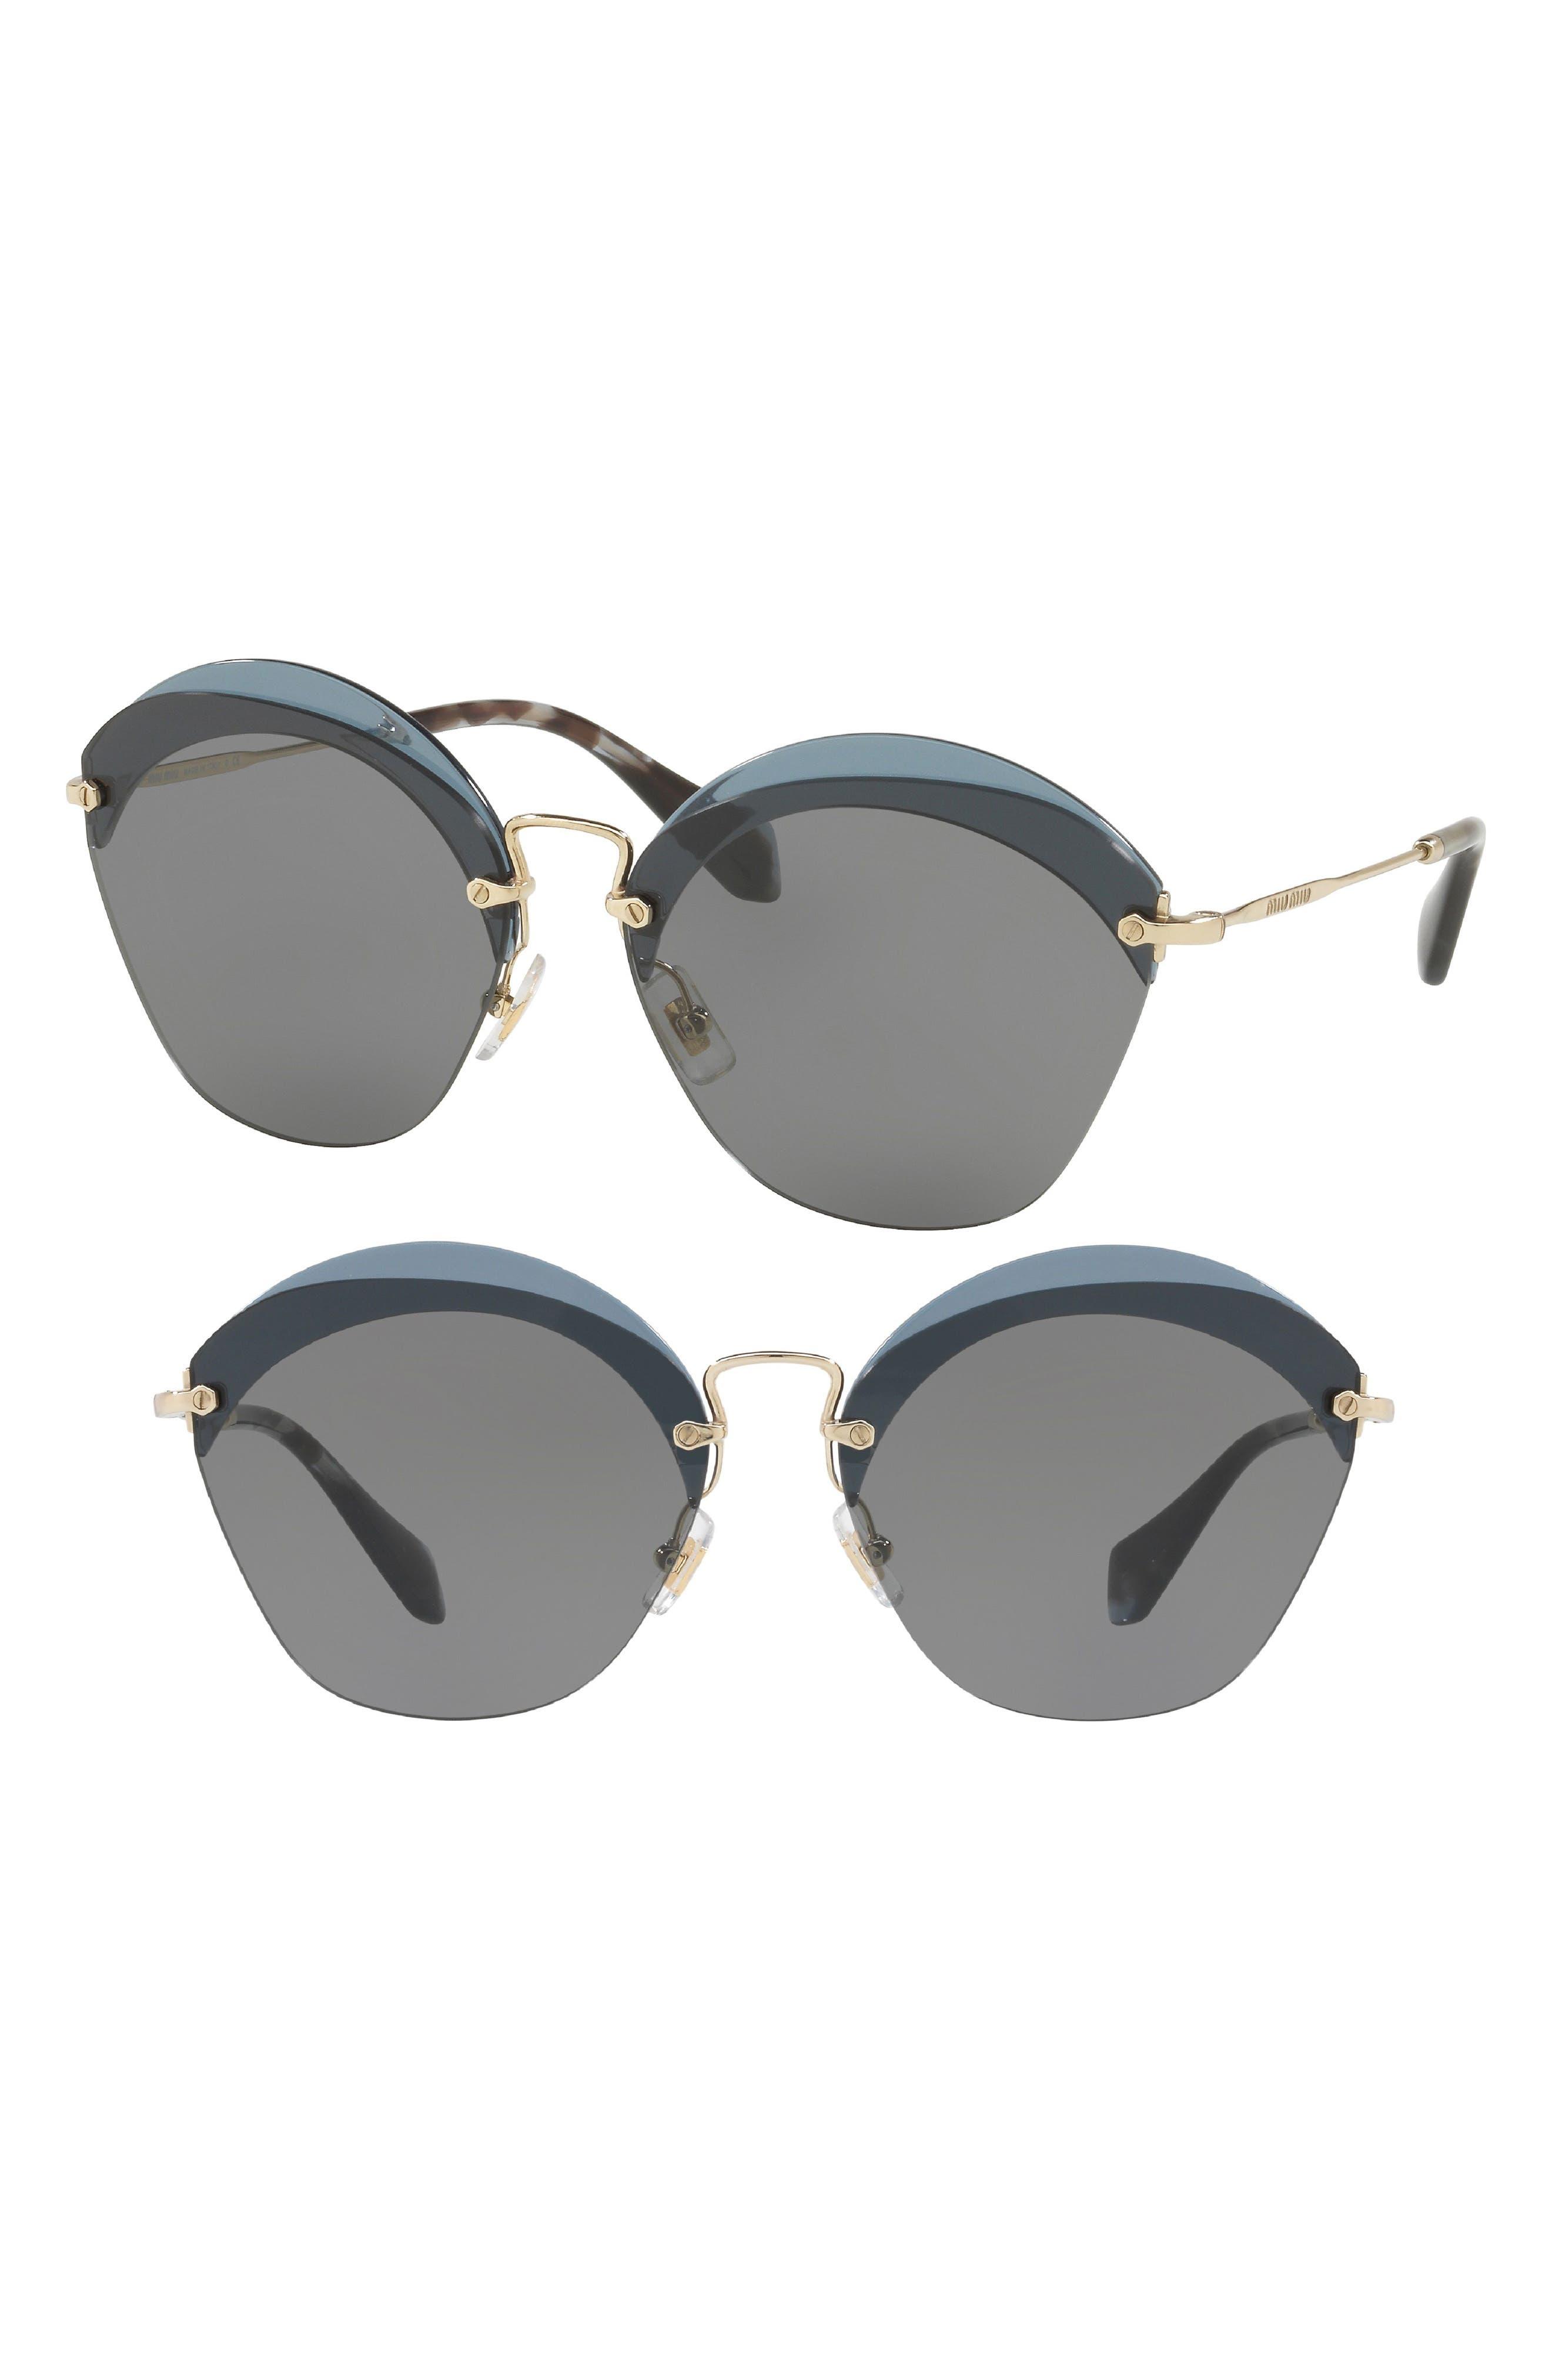 62mm Sunglasses,                         Main,                         color, Transparent Blue Solid